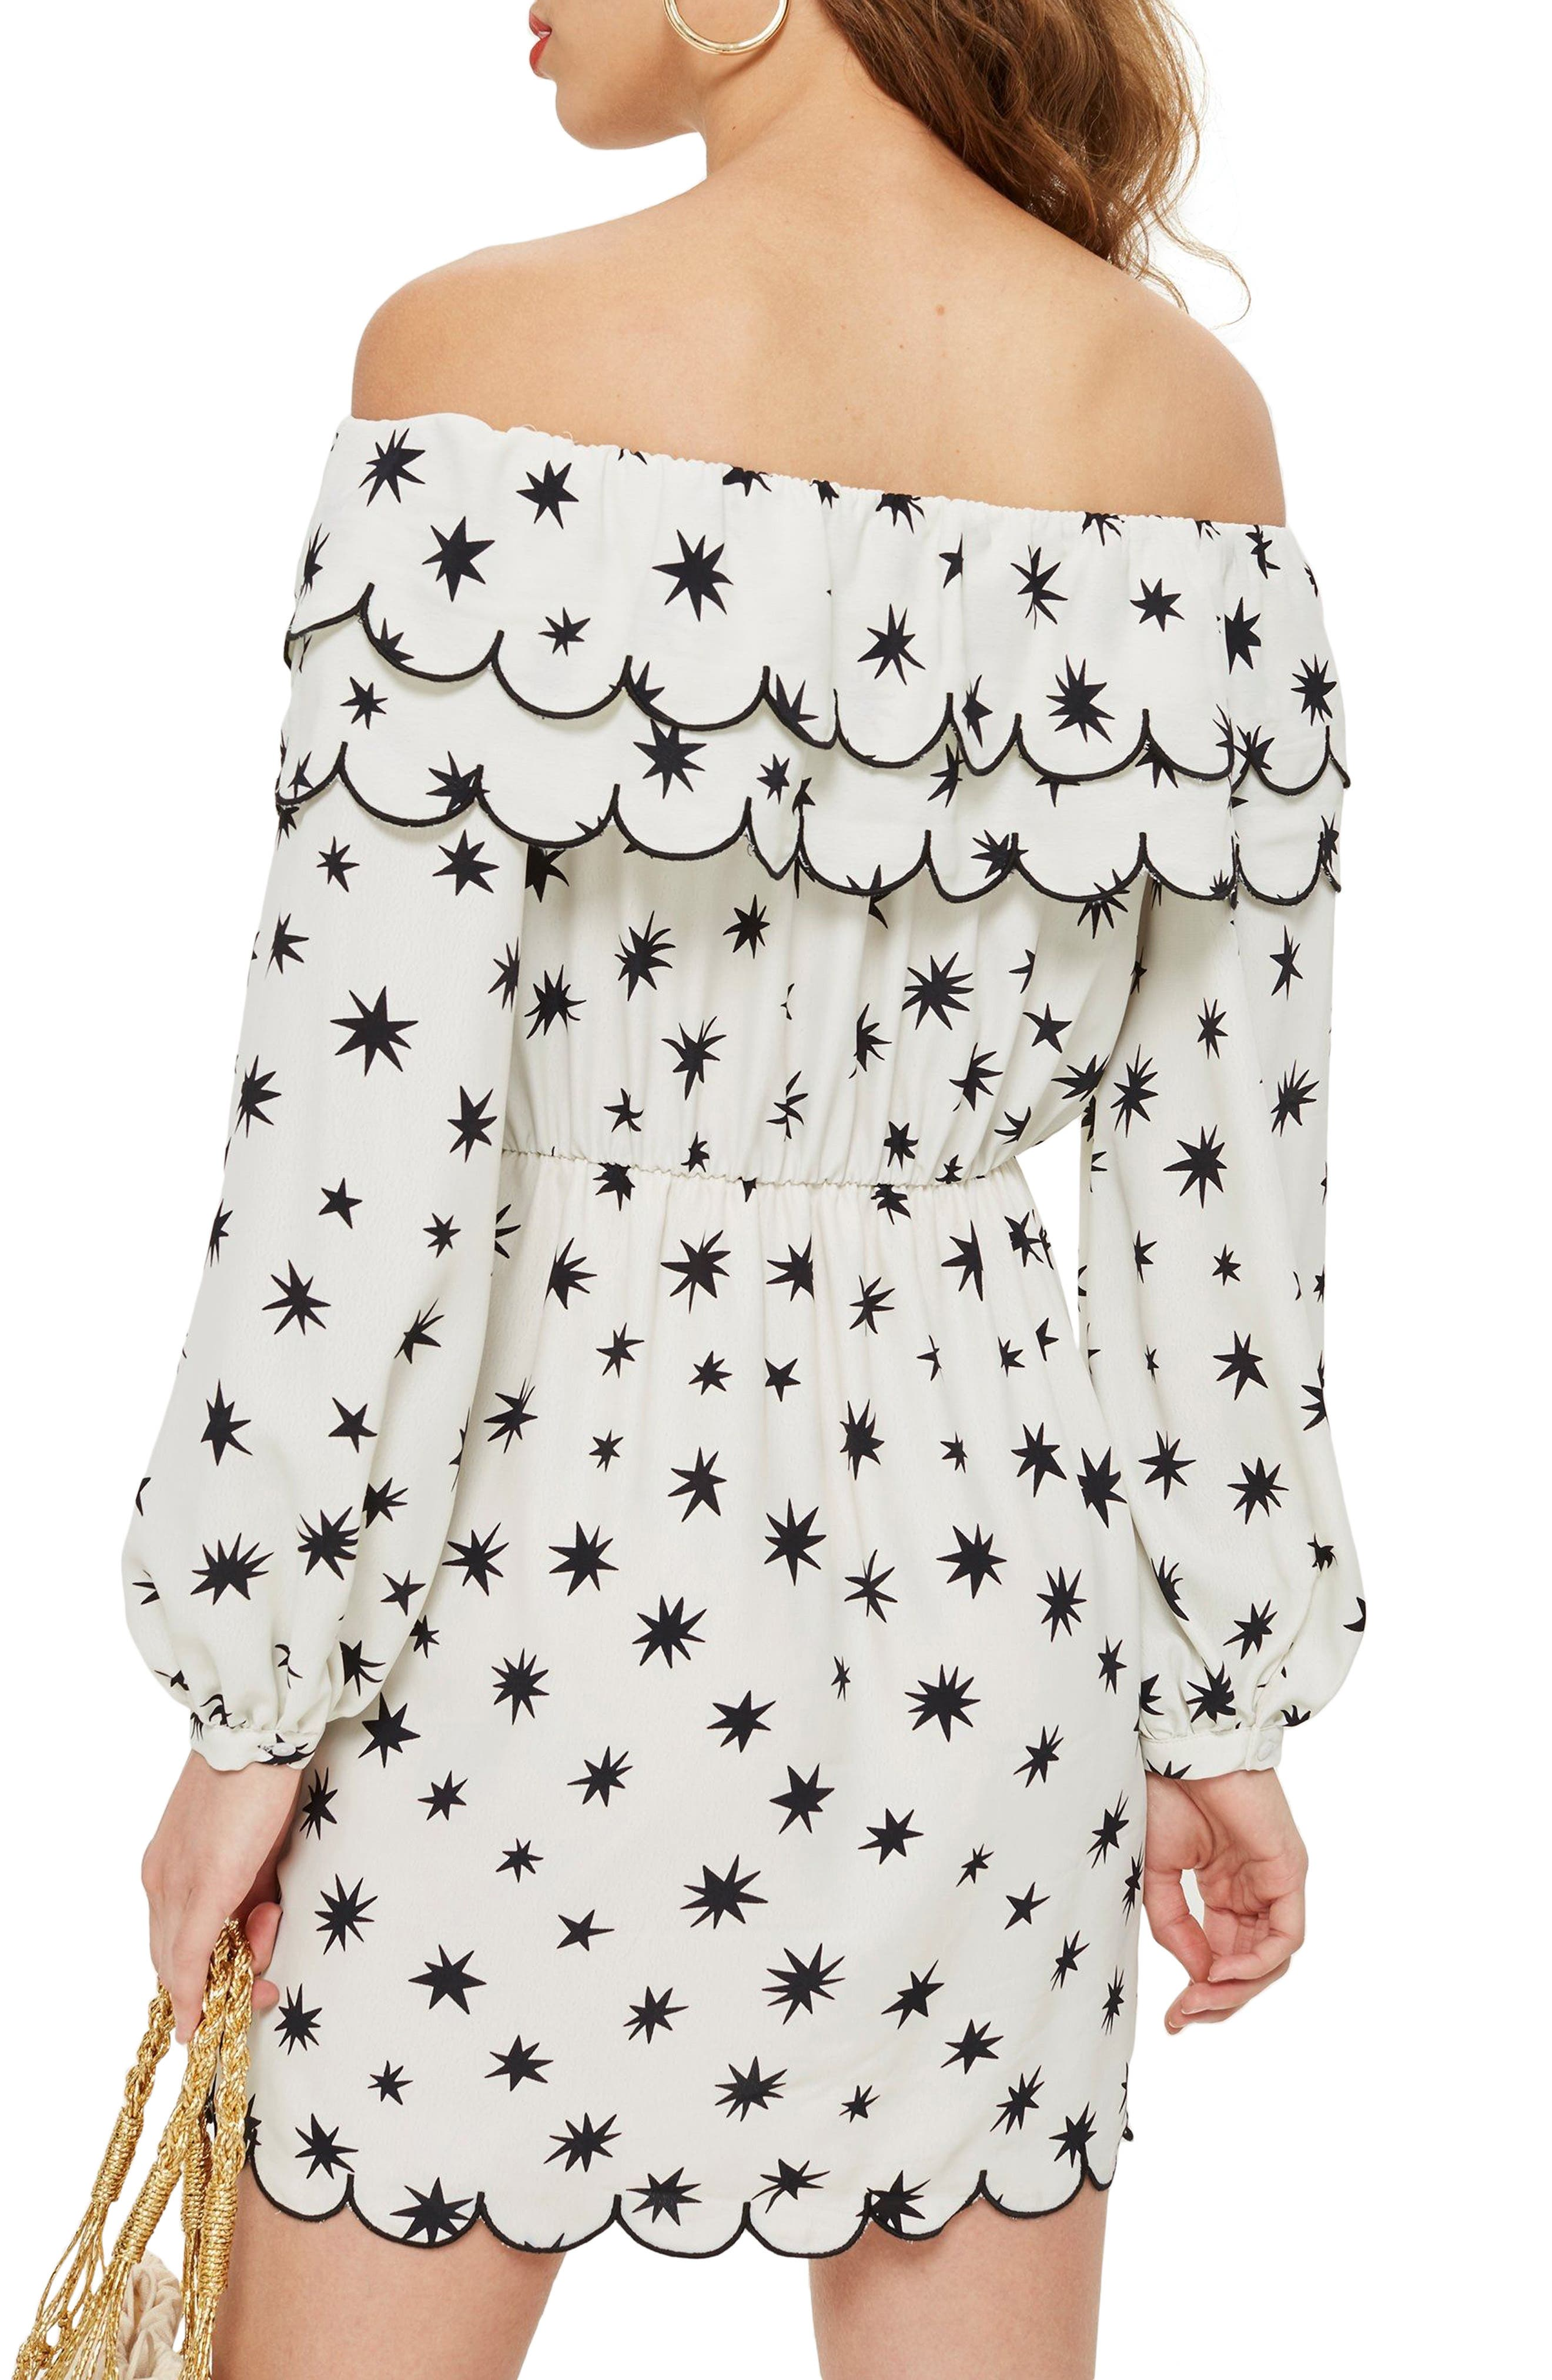 Scallop Star Off the Shoulder Dress,                             Alternate thumbnail 2, color,                             100